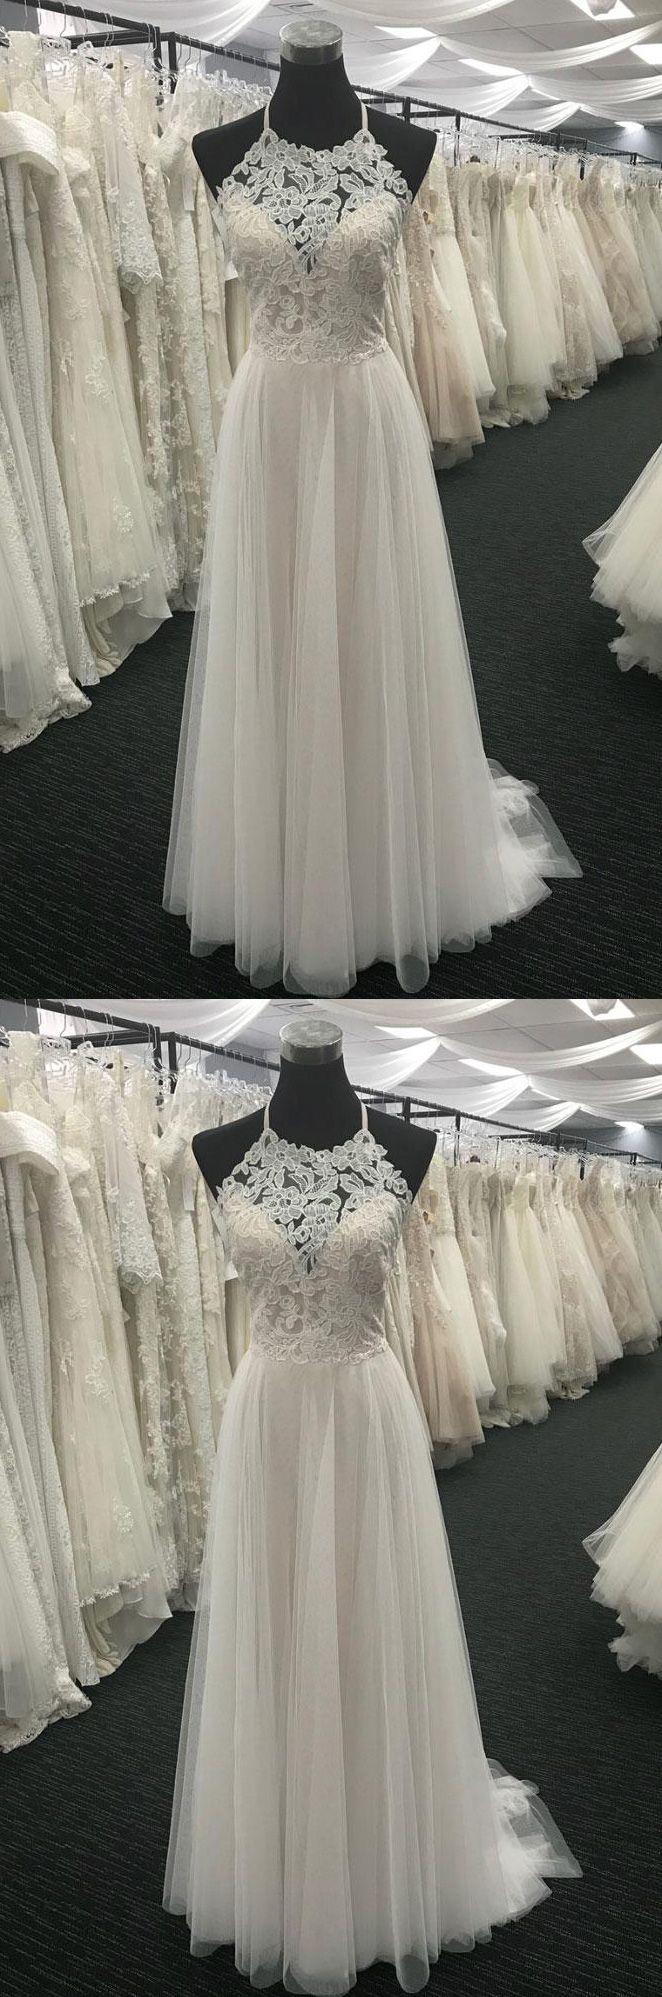 Simple Halter Long Ivory Lace Prom Dress/Wedding Dress Dresses#Promdressesonline#promdresses2018#lacepromdress#whitepromdresses#eveningdresses#beachweddingdresses2018#weddingdresses#weddingpartydresses#bridesmaiddresses#halter